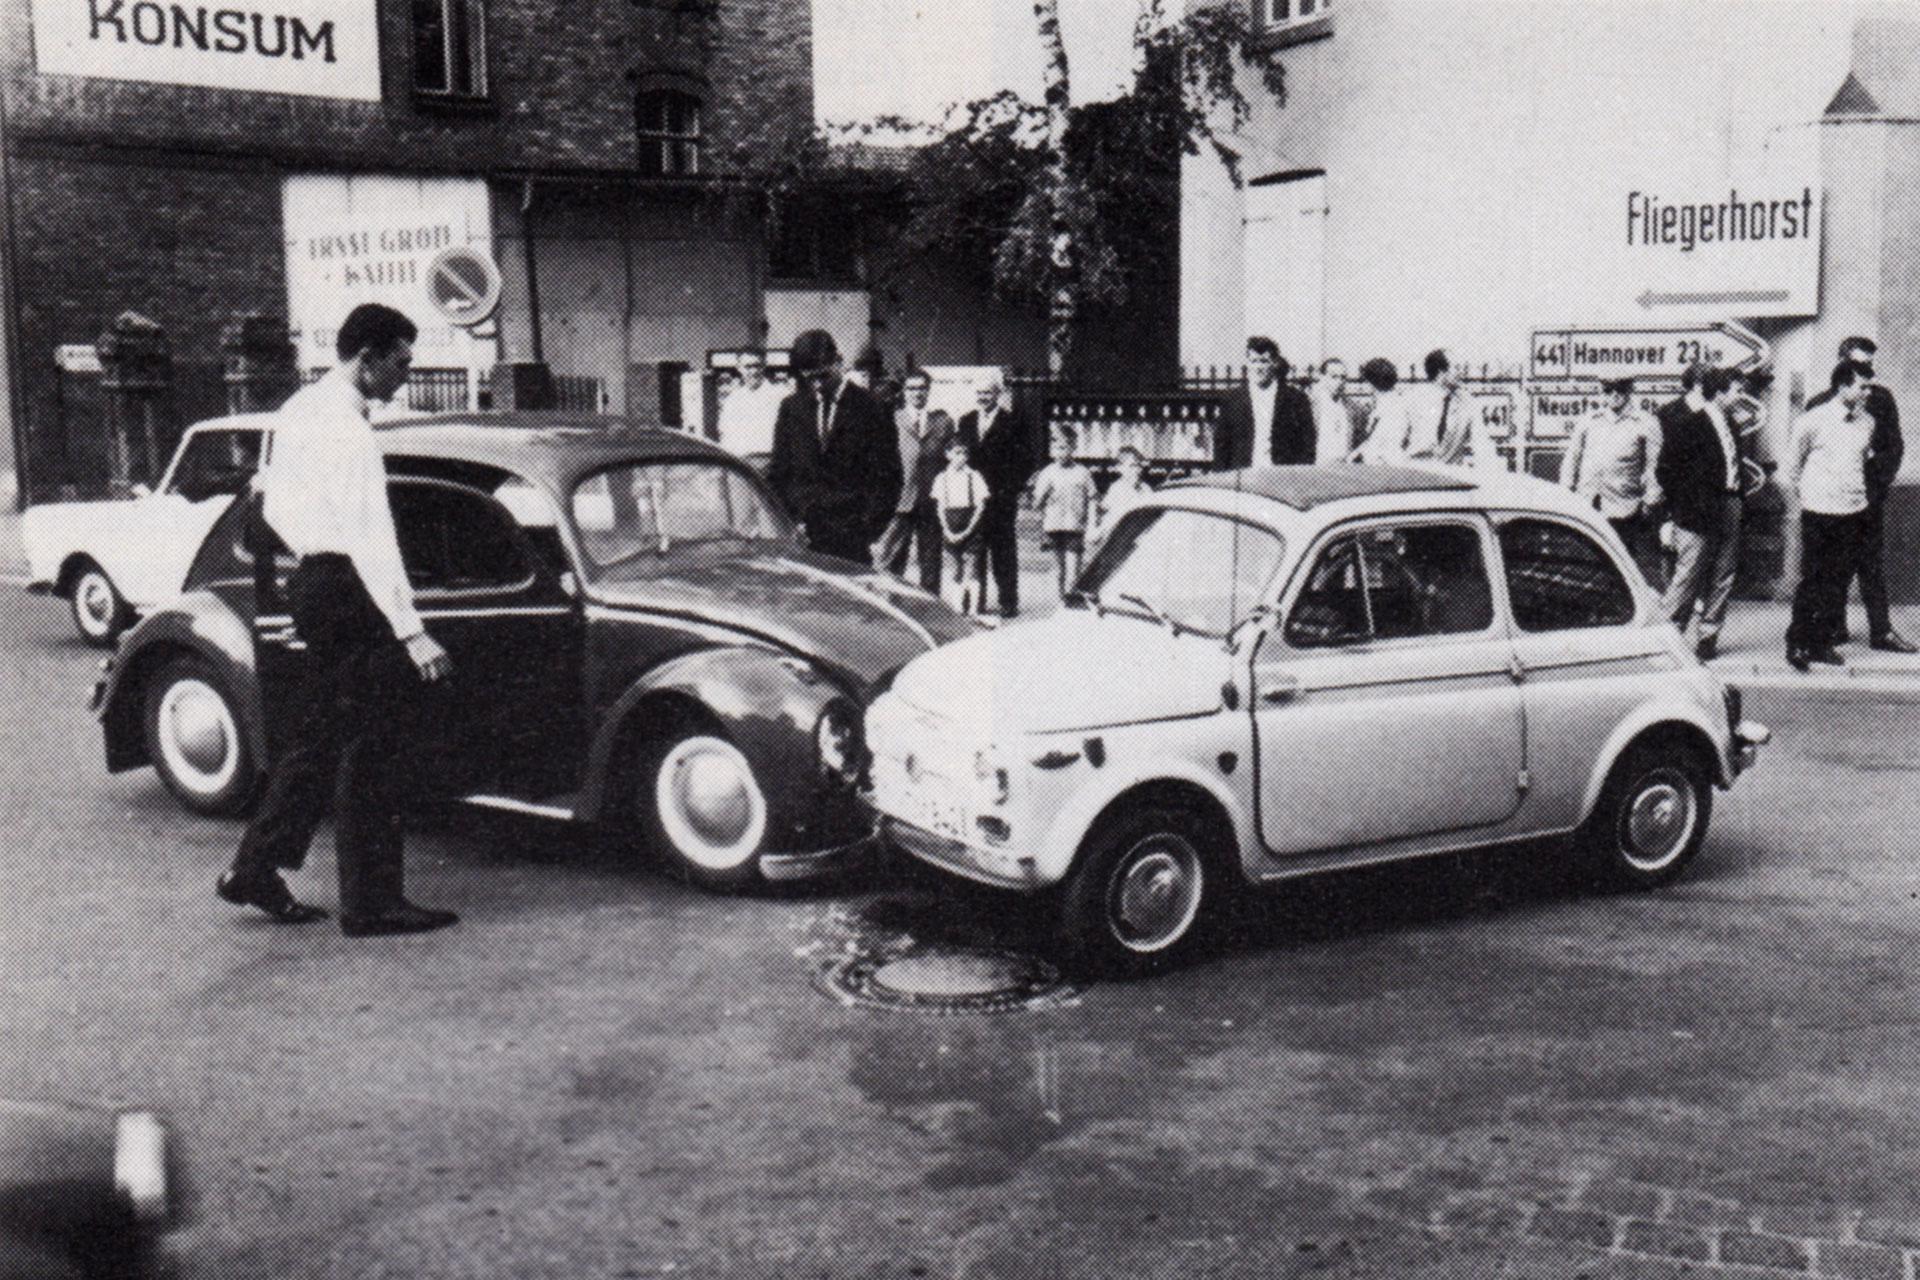 Autounfall mit VW Käfer und Fiat 500 » Wunstorfer Auepost